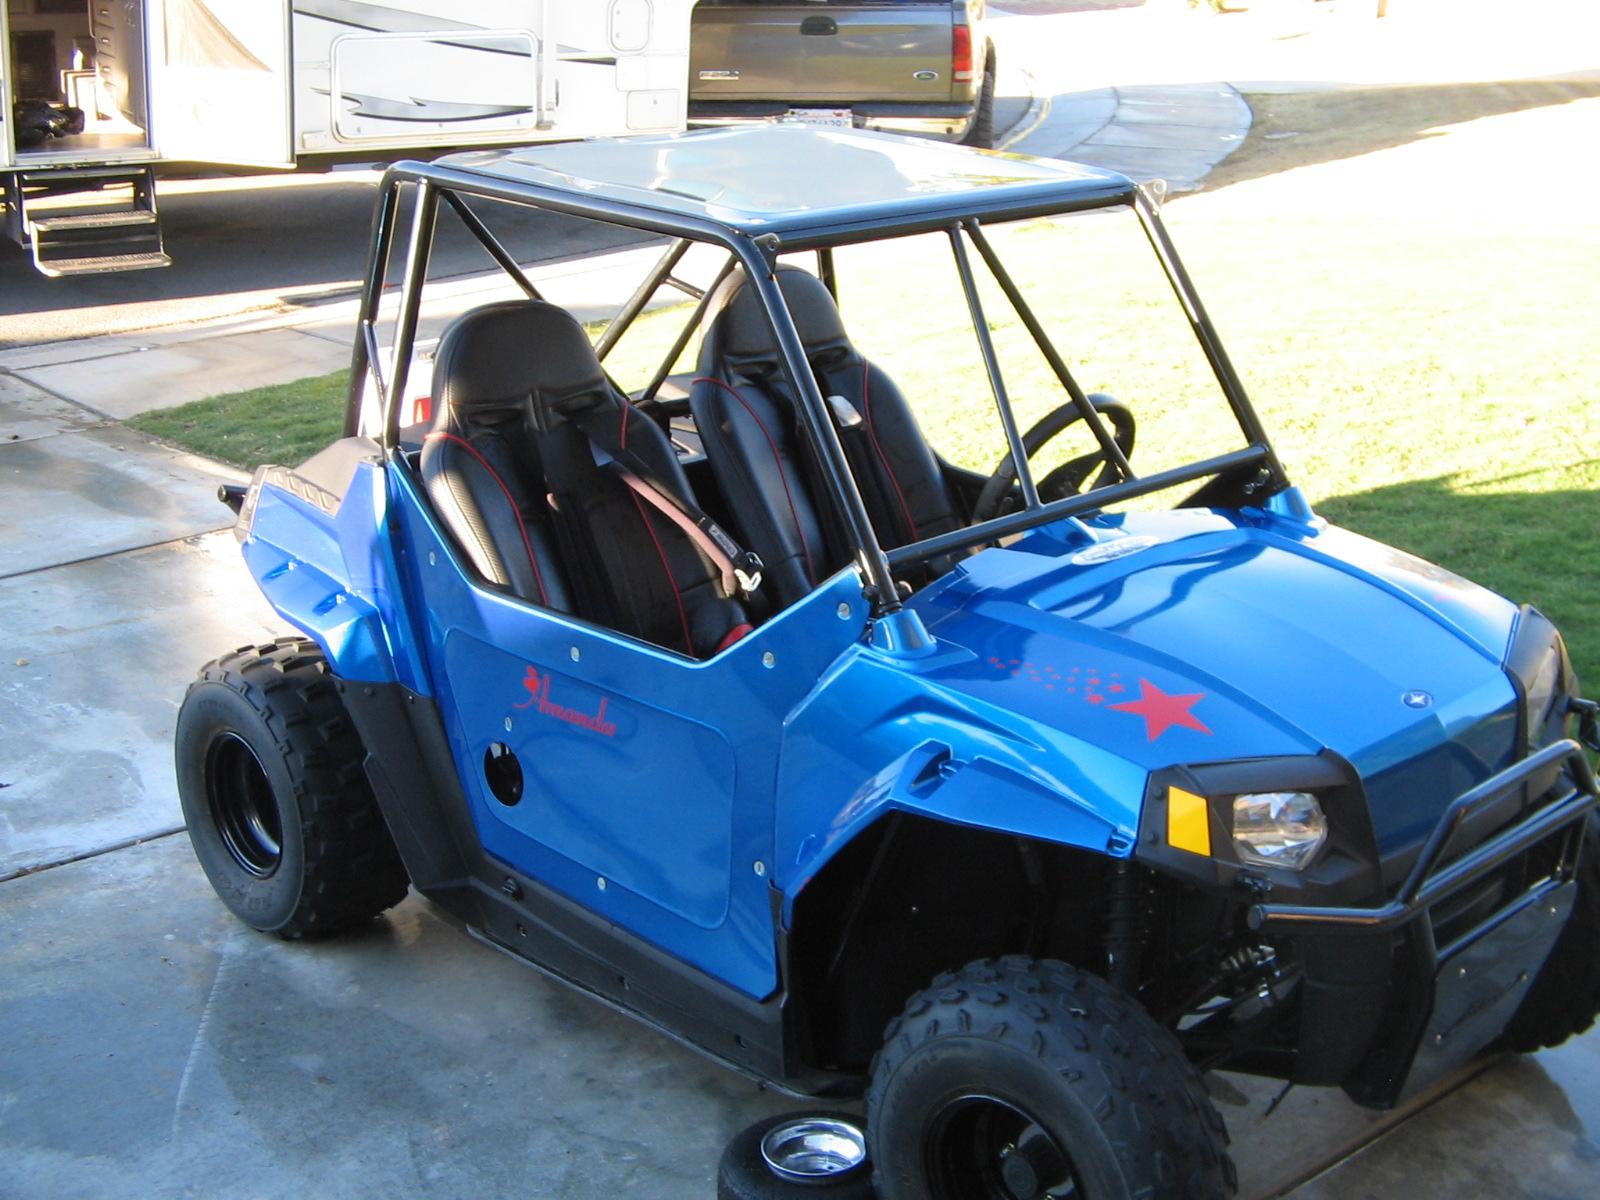 Polaris rzr 170 $4999 - Kawasaki Teryx Forum